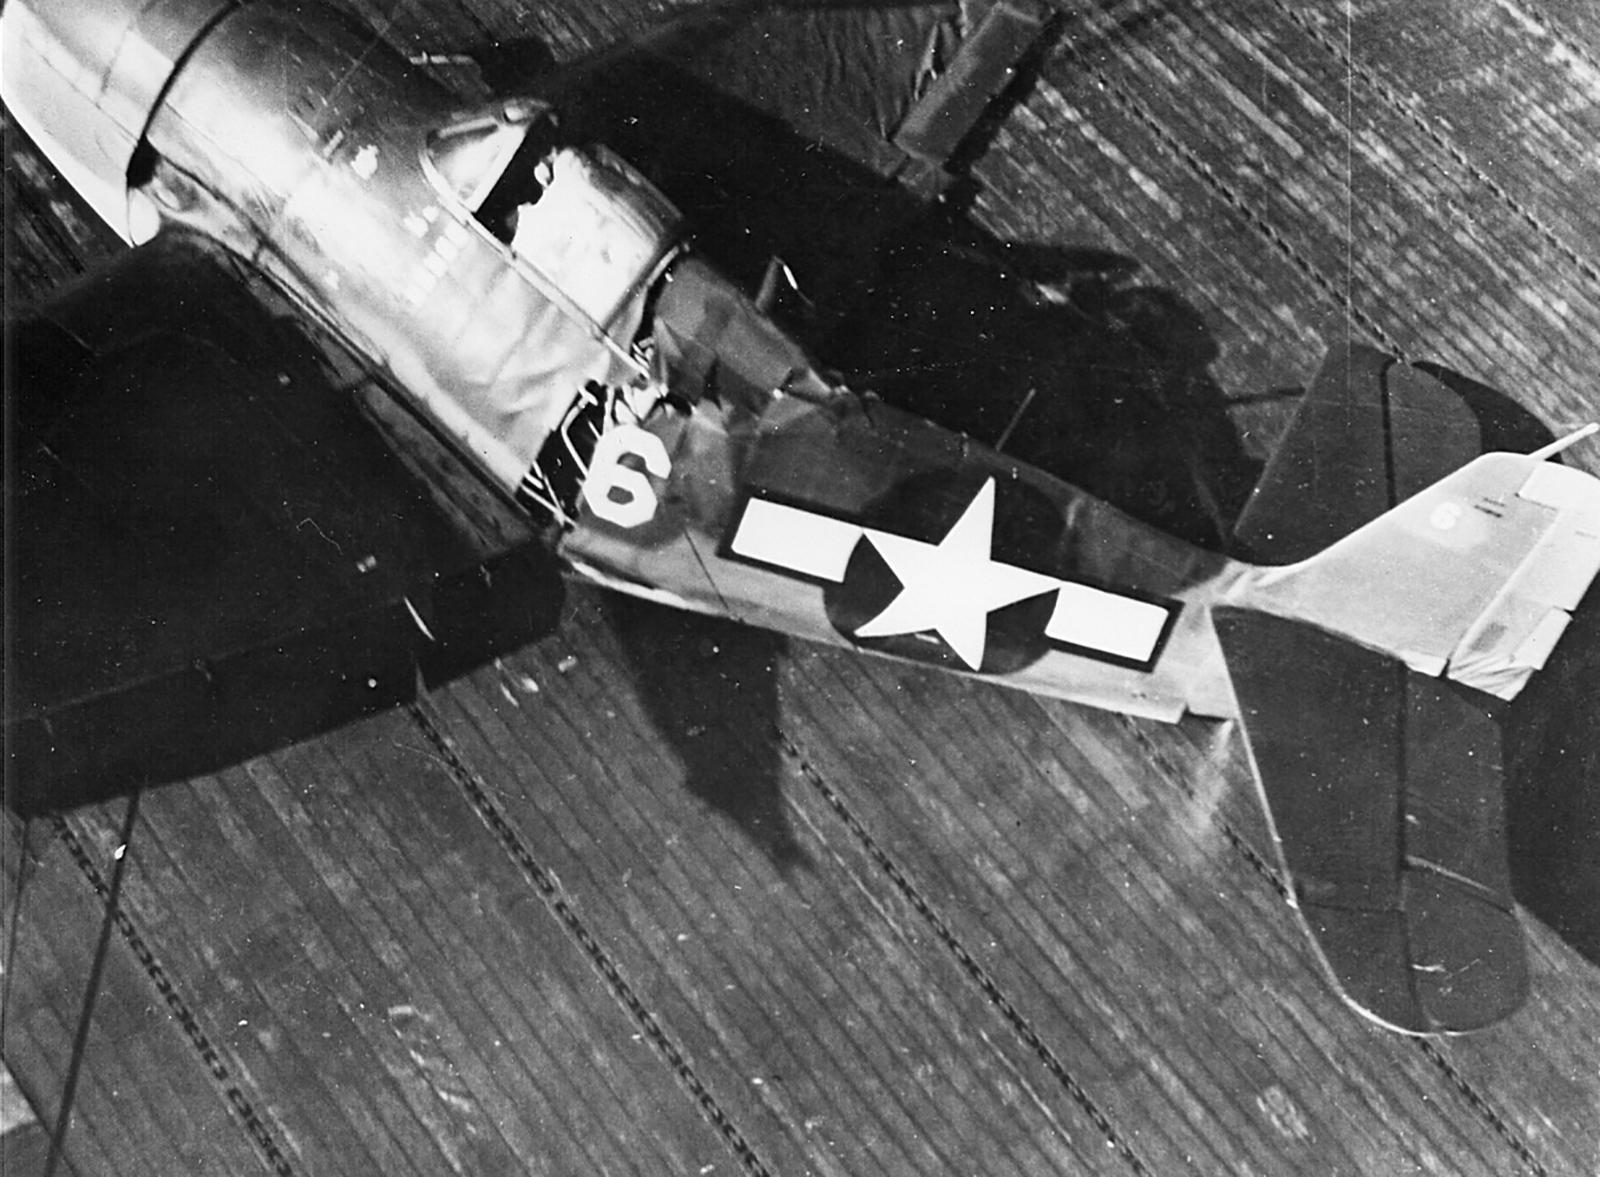 Grumman F6F 3 Hellcat VF 16 White 6 landing mishap CV 16 USS Lexington 1944 01